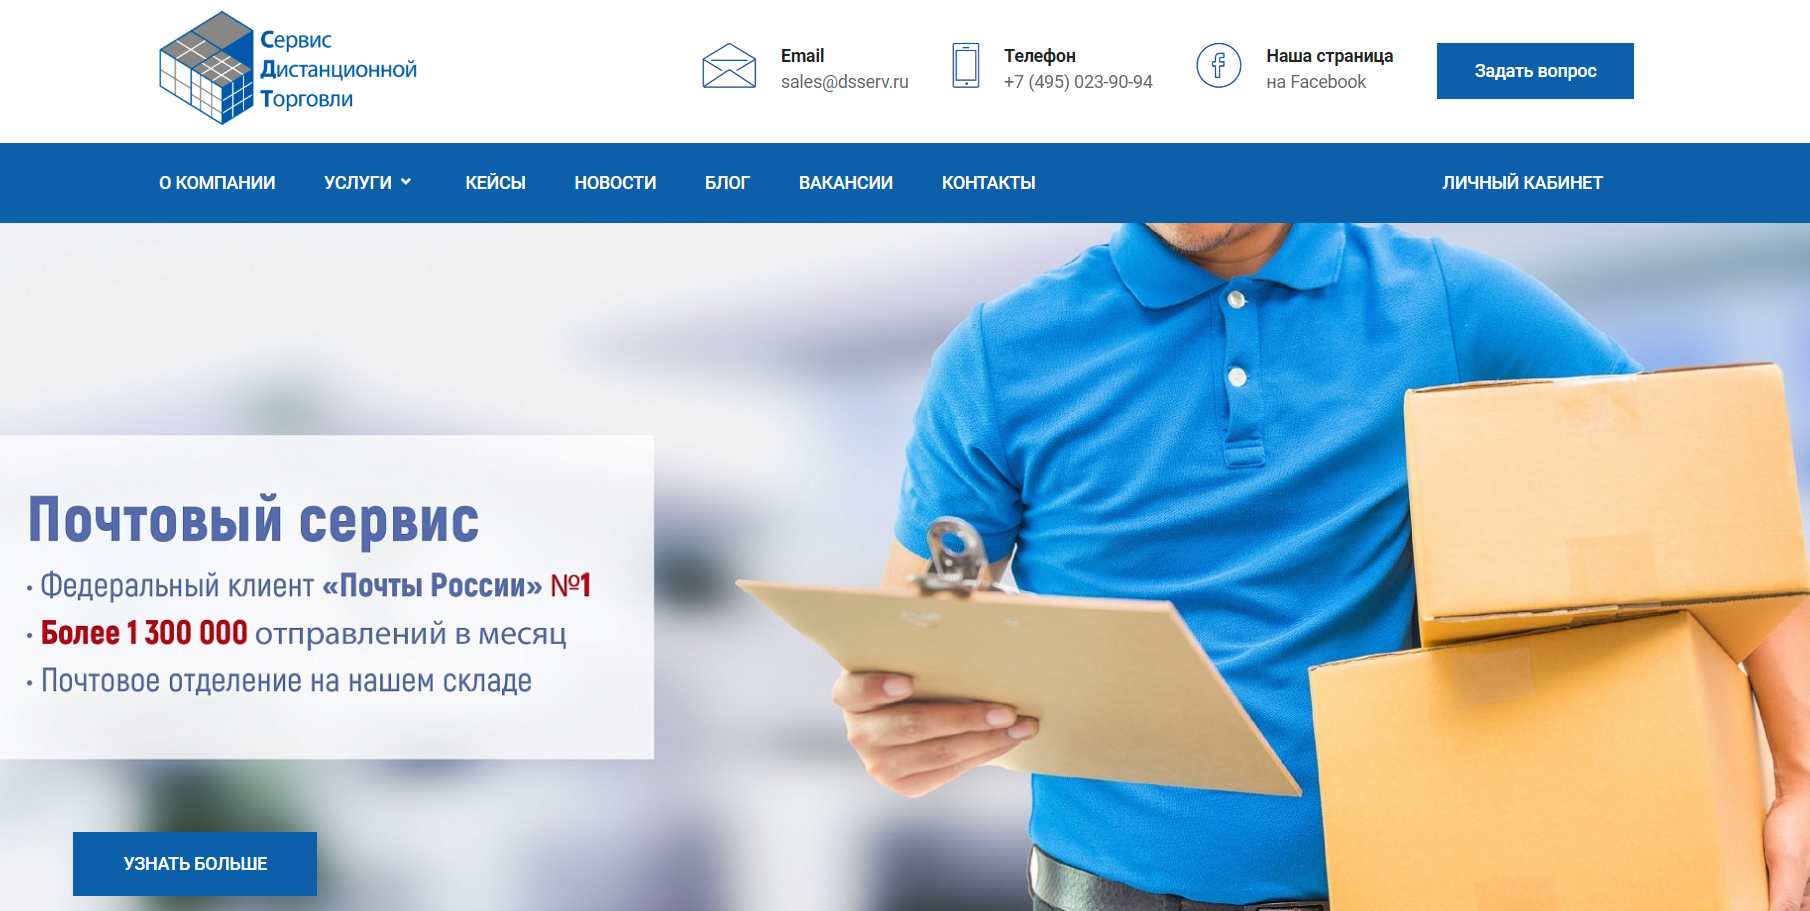 Сервис дистанционной торговли - СДТ